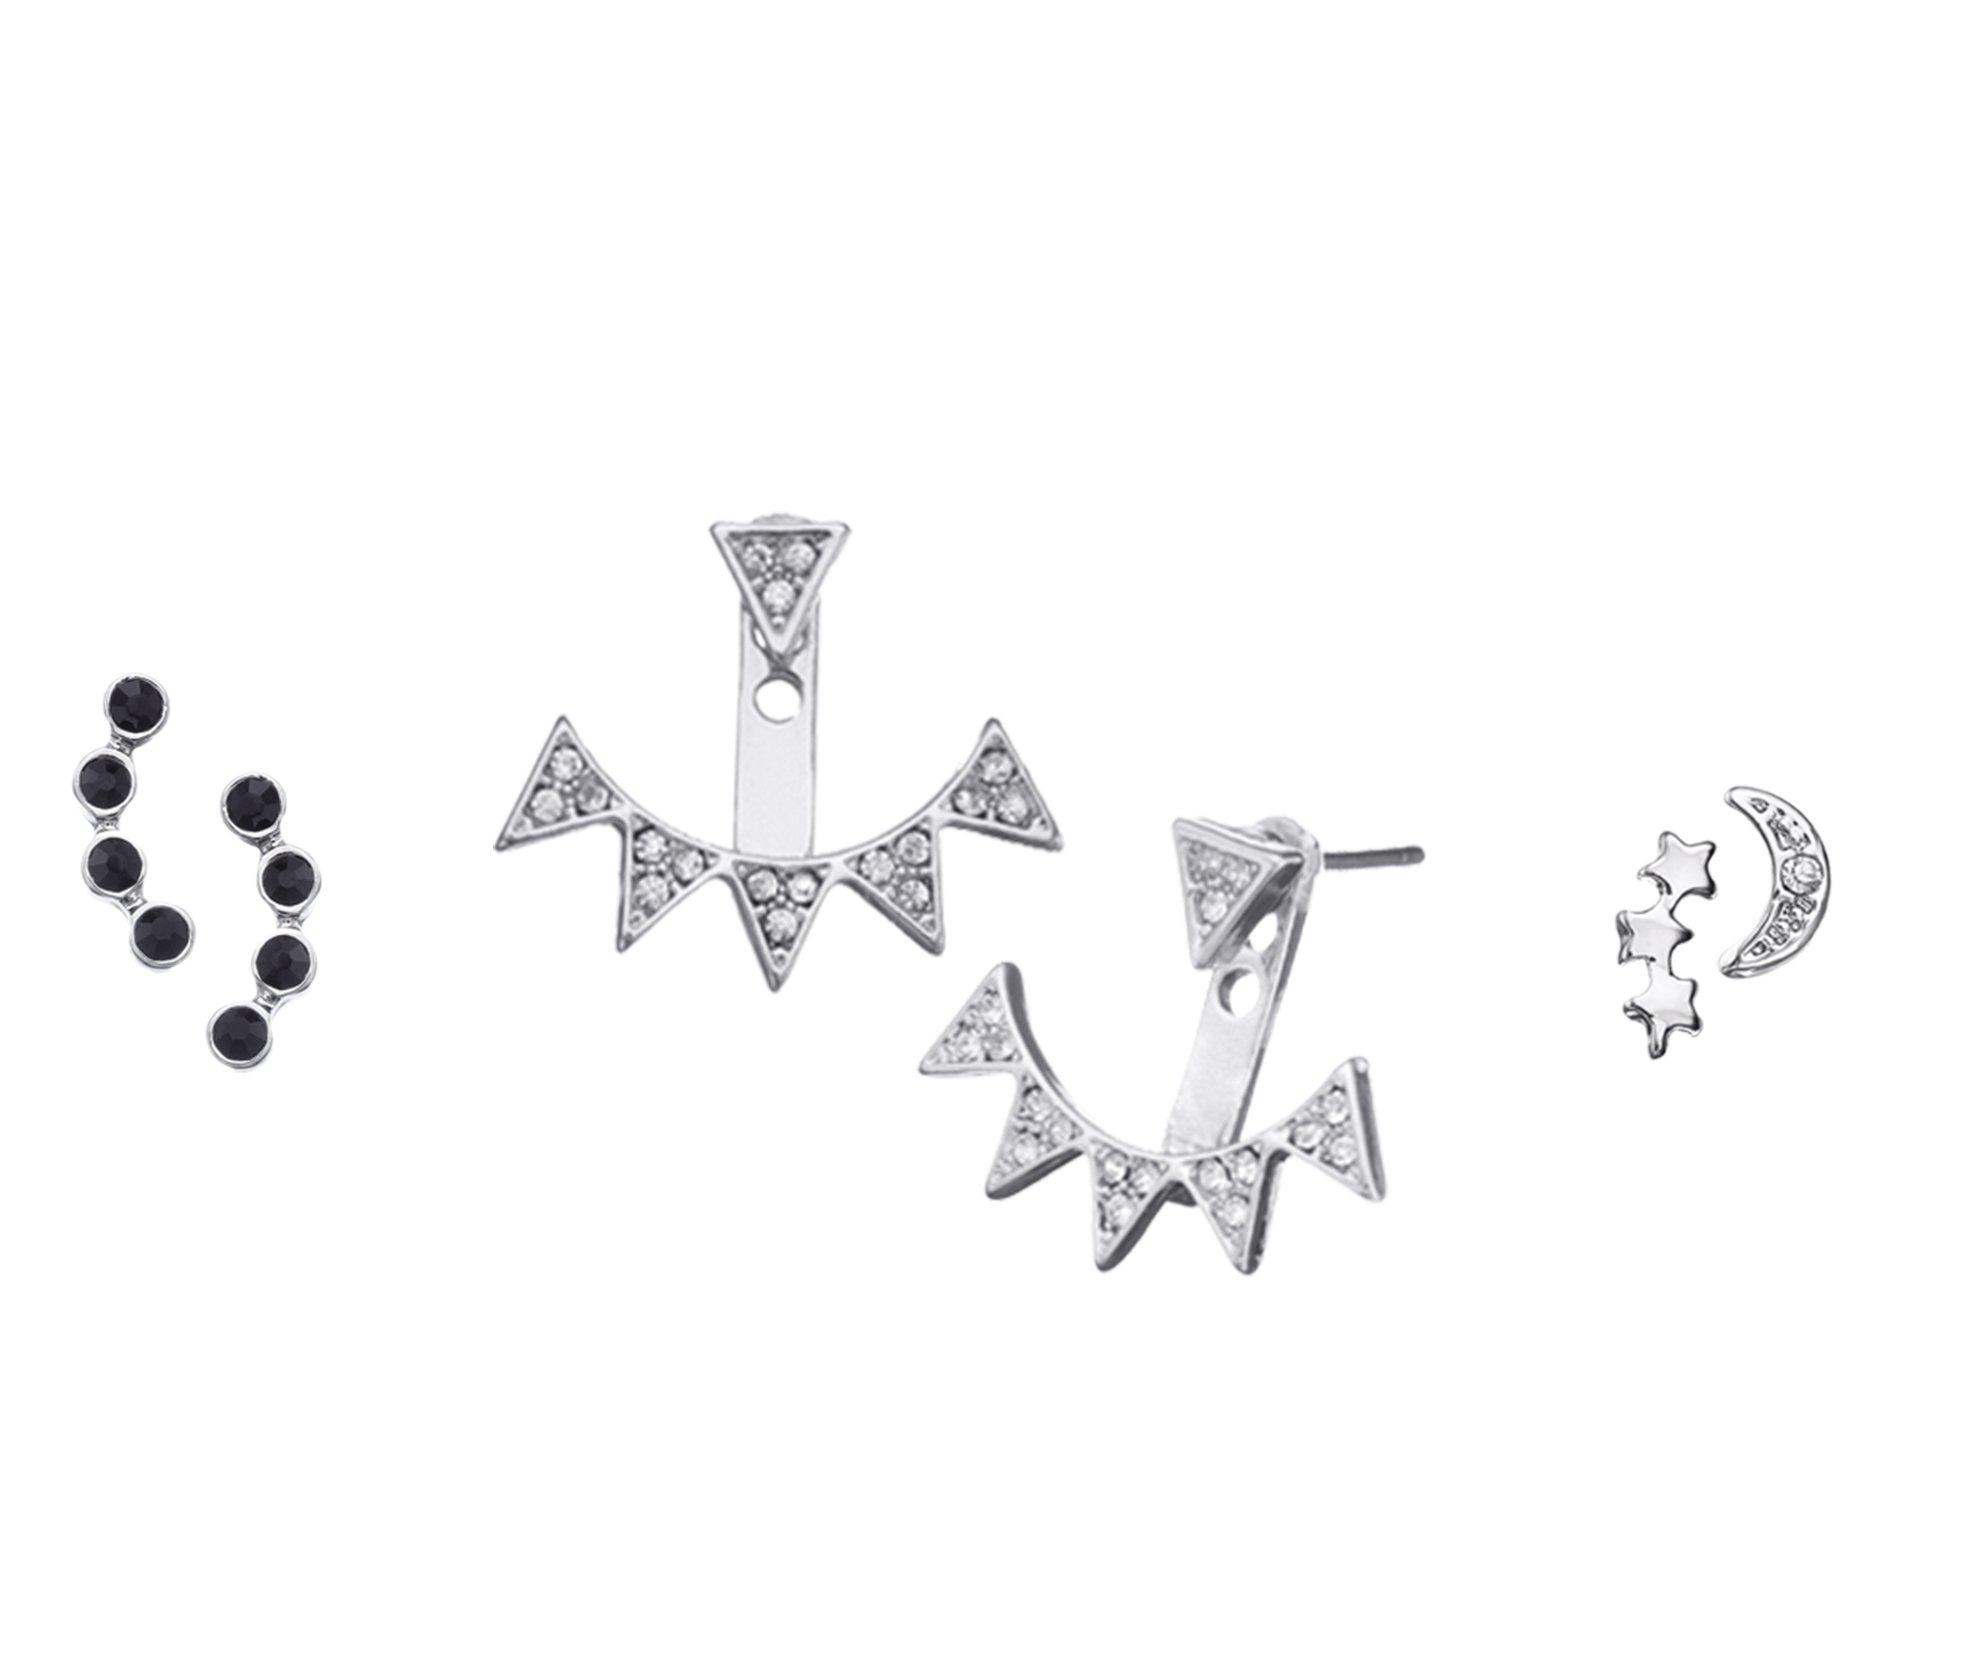 Rock Queen Earring Stud Set (silver-plated-base)